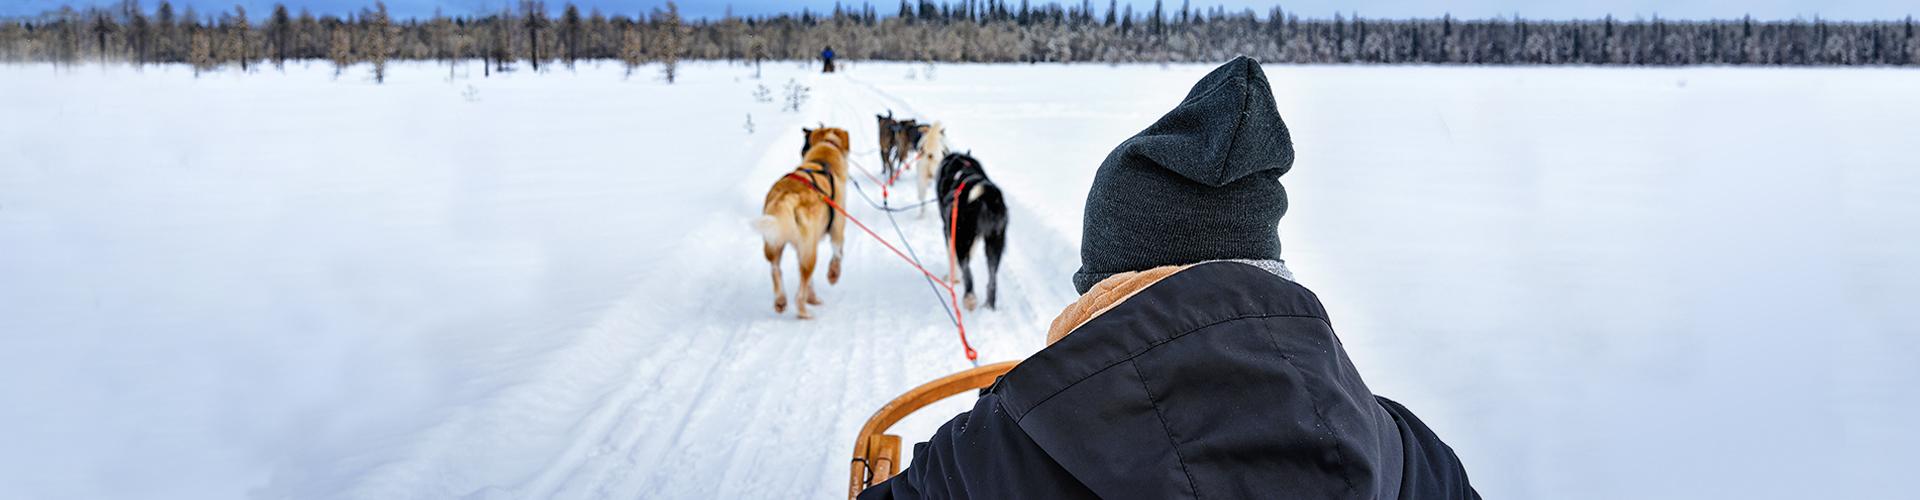 Finnish Lapland in Winter